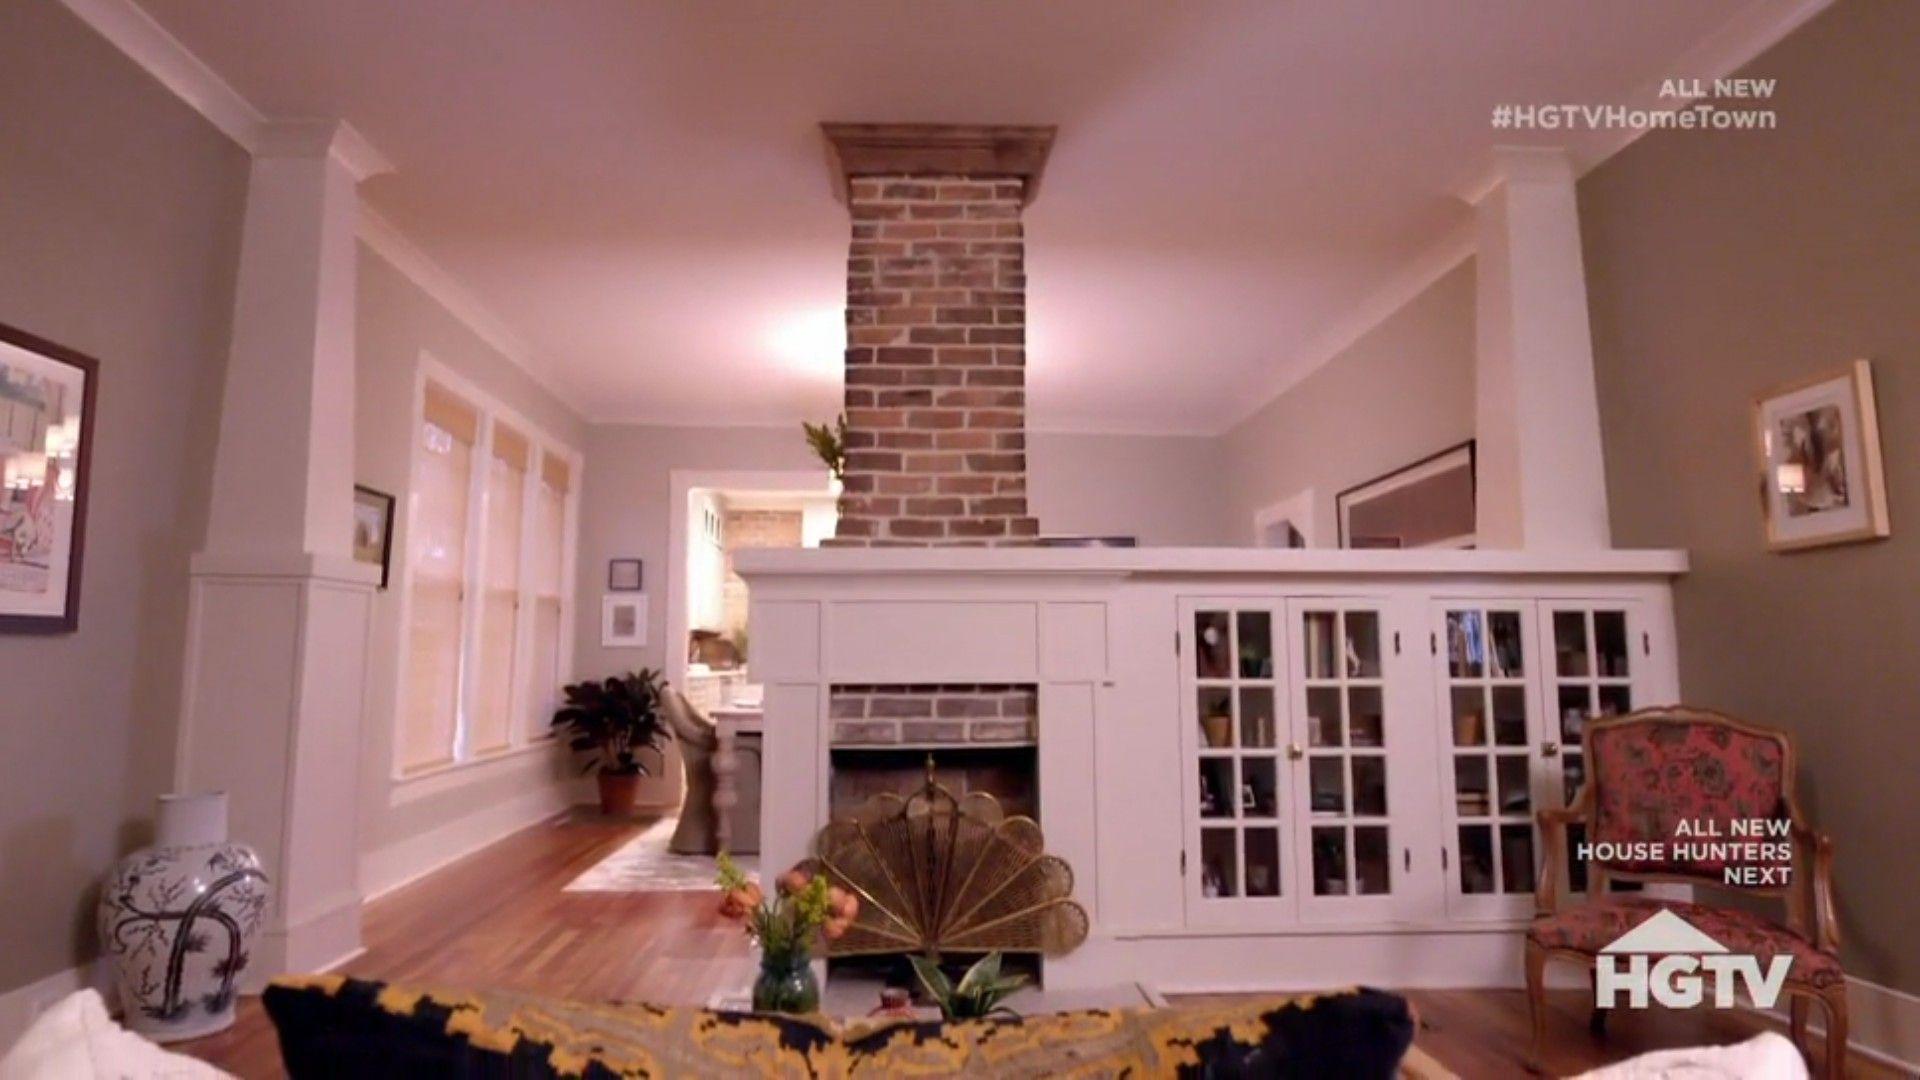 Hgtv Hometown Season 2 Episode 8 Updated Original Fireplace Home Town Hgtv Cottage Style Homes Craftsman Cottage